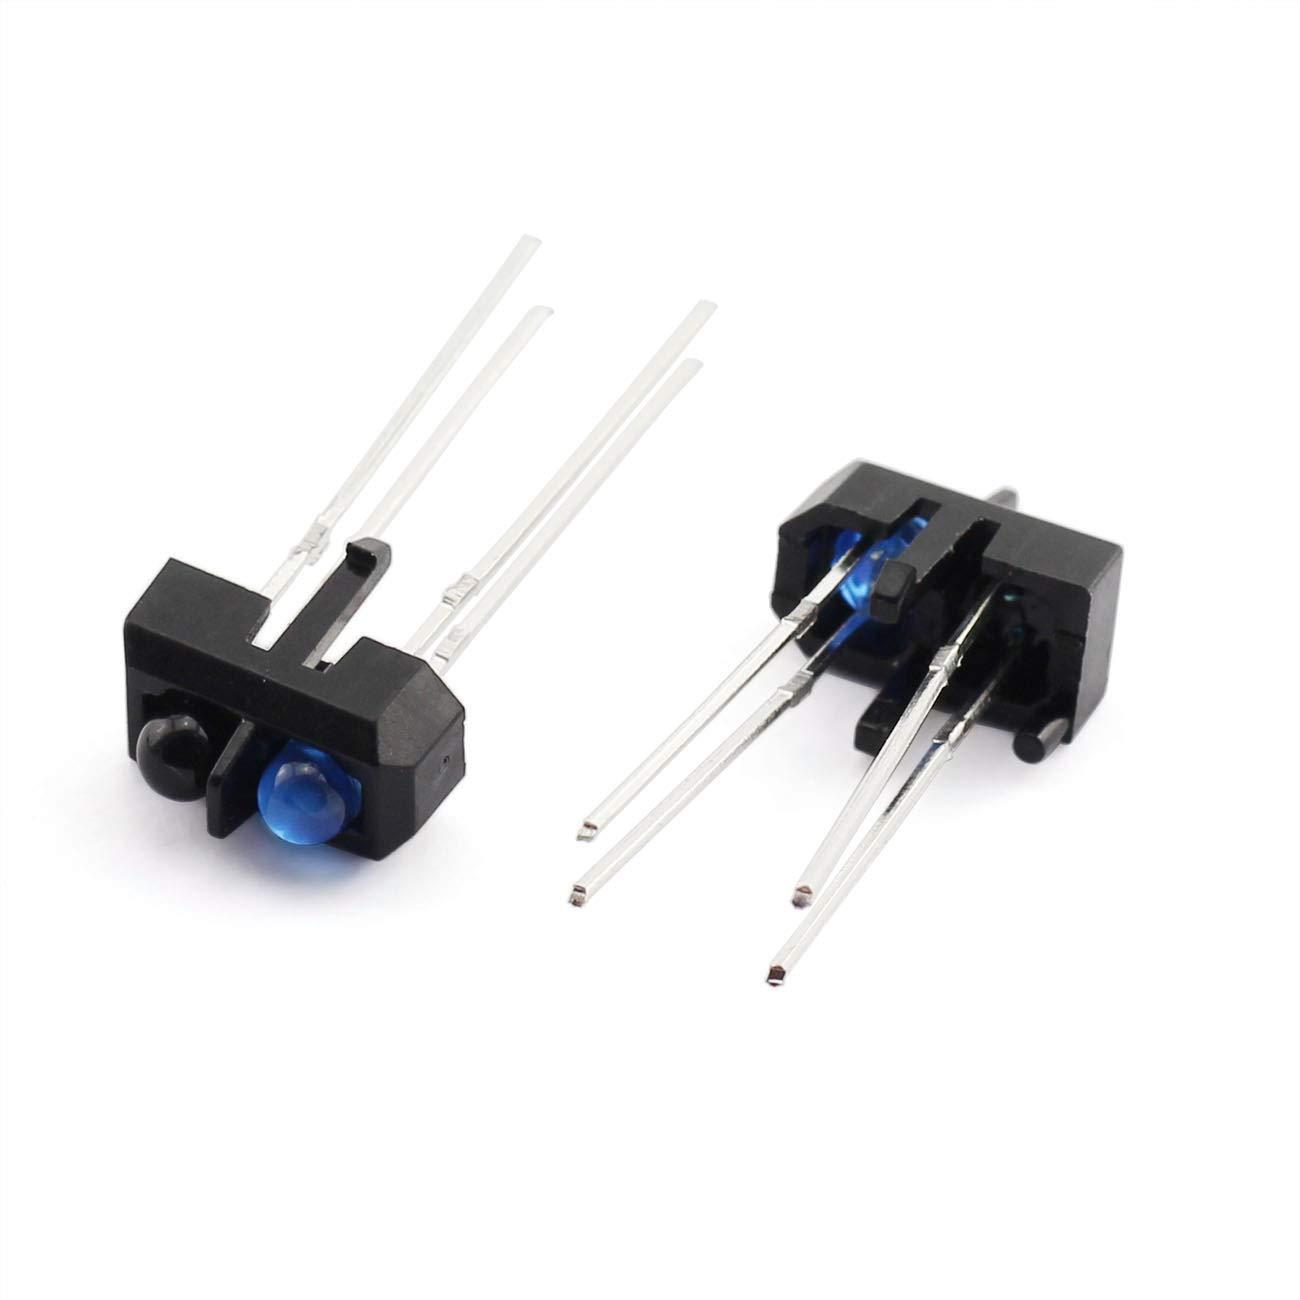 ZRM/&E 20pcs TCRT5000 Photoelectric Sensors Infrared Reflective Optical Sensor for Smart Car IR Photoelectric Switch